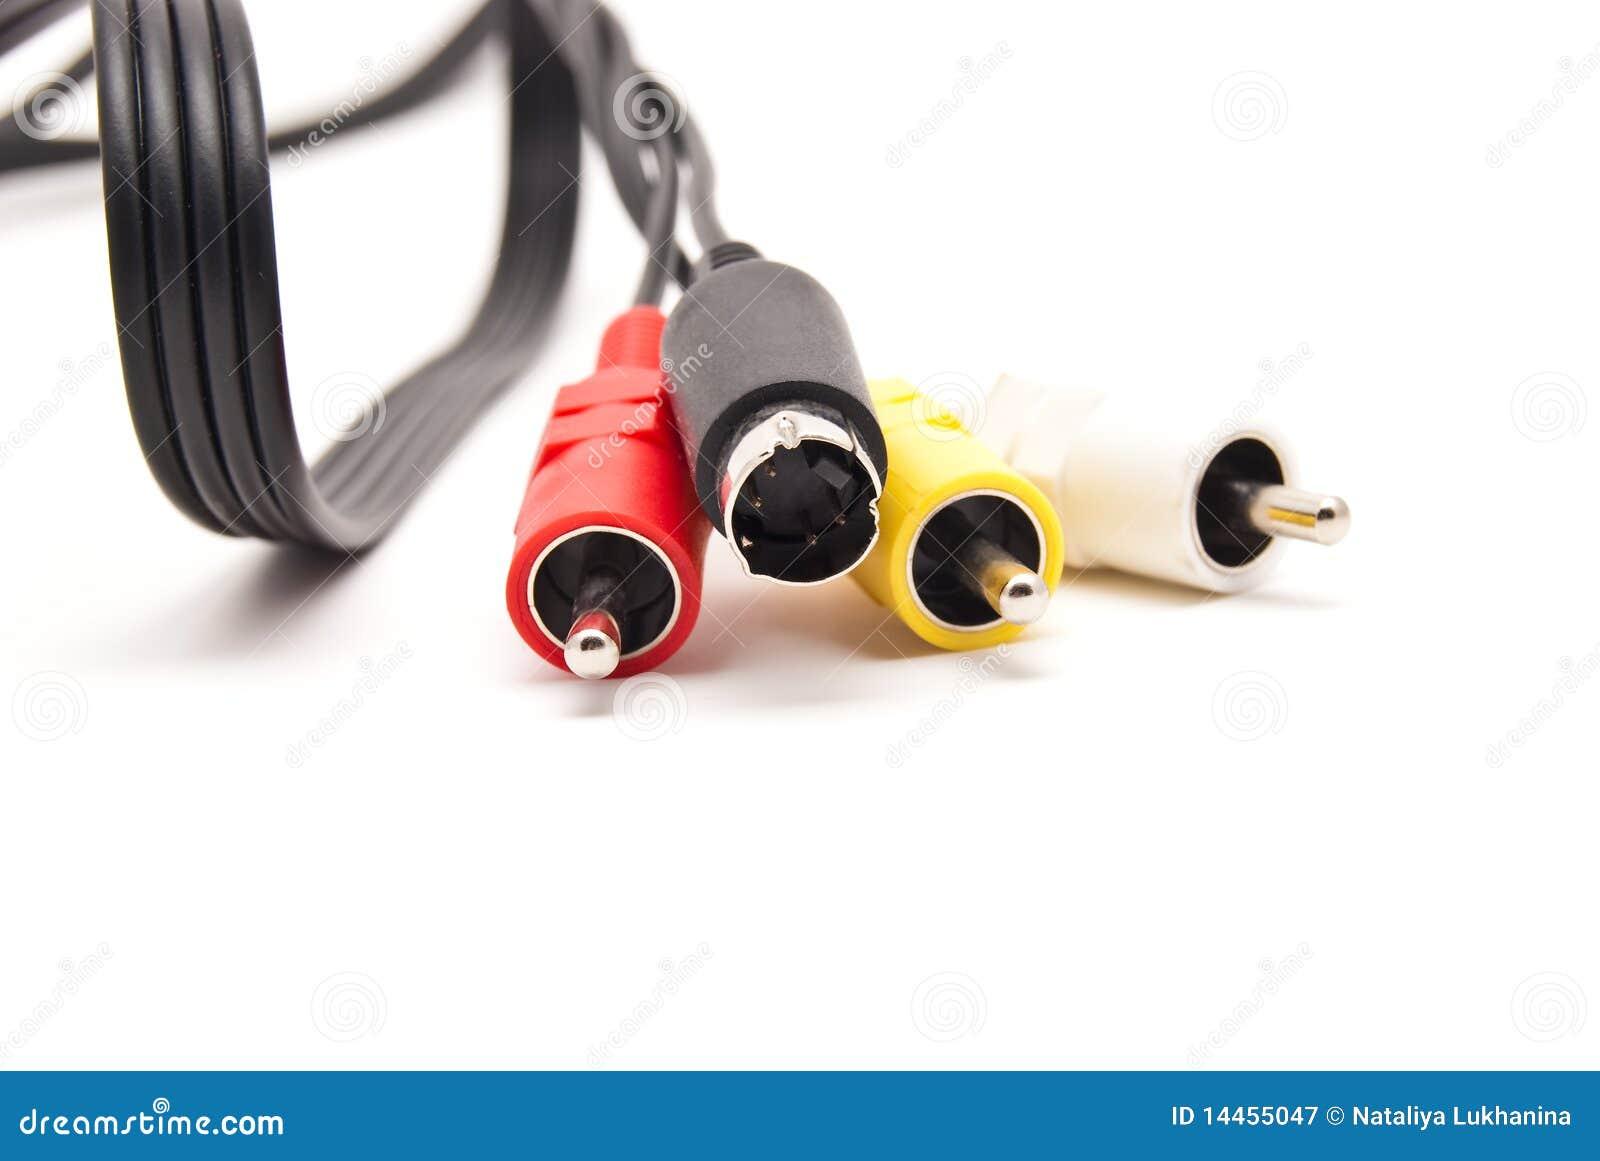 Conectores video e audio